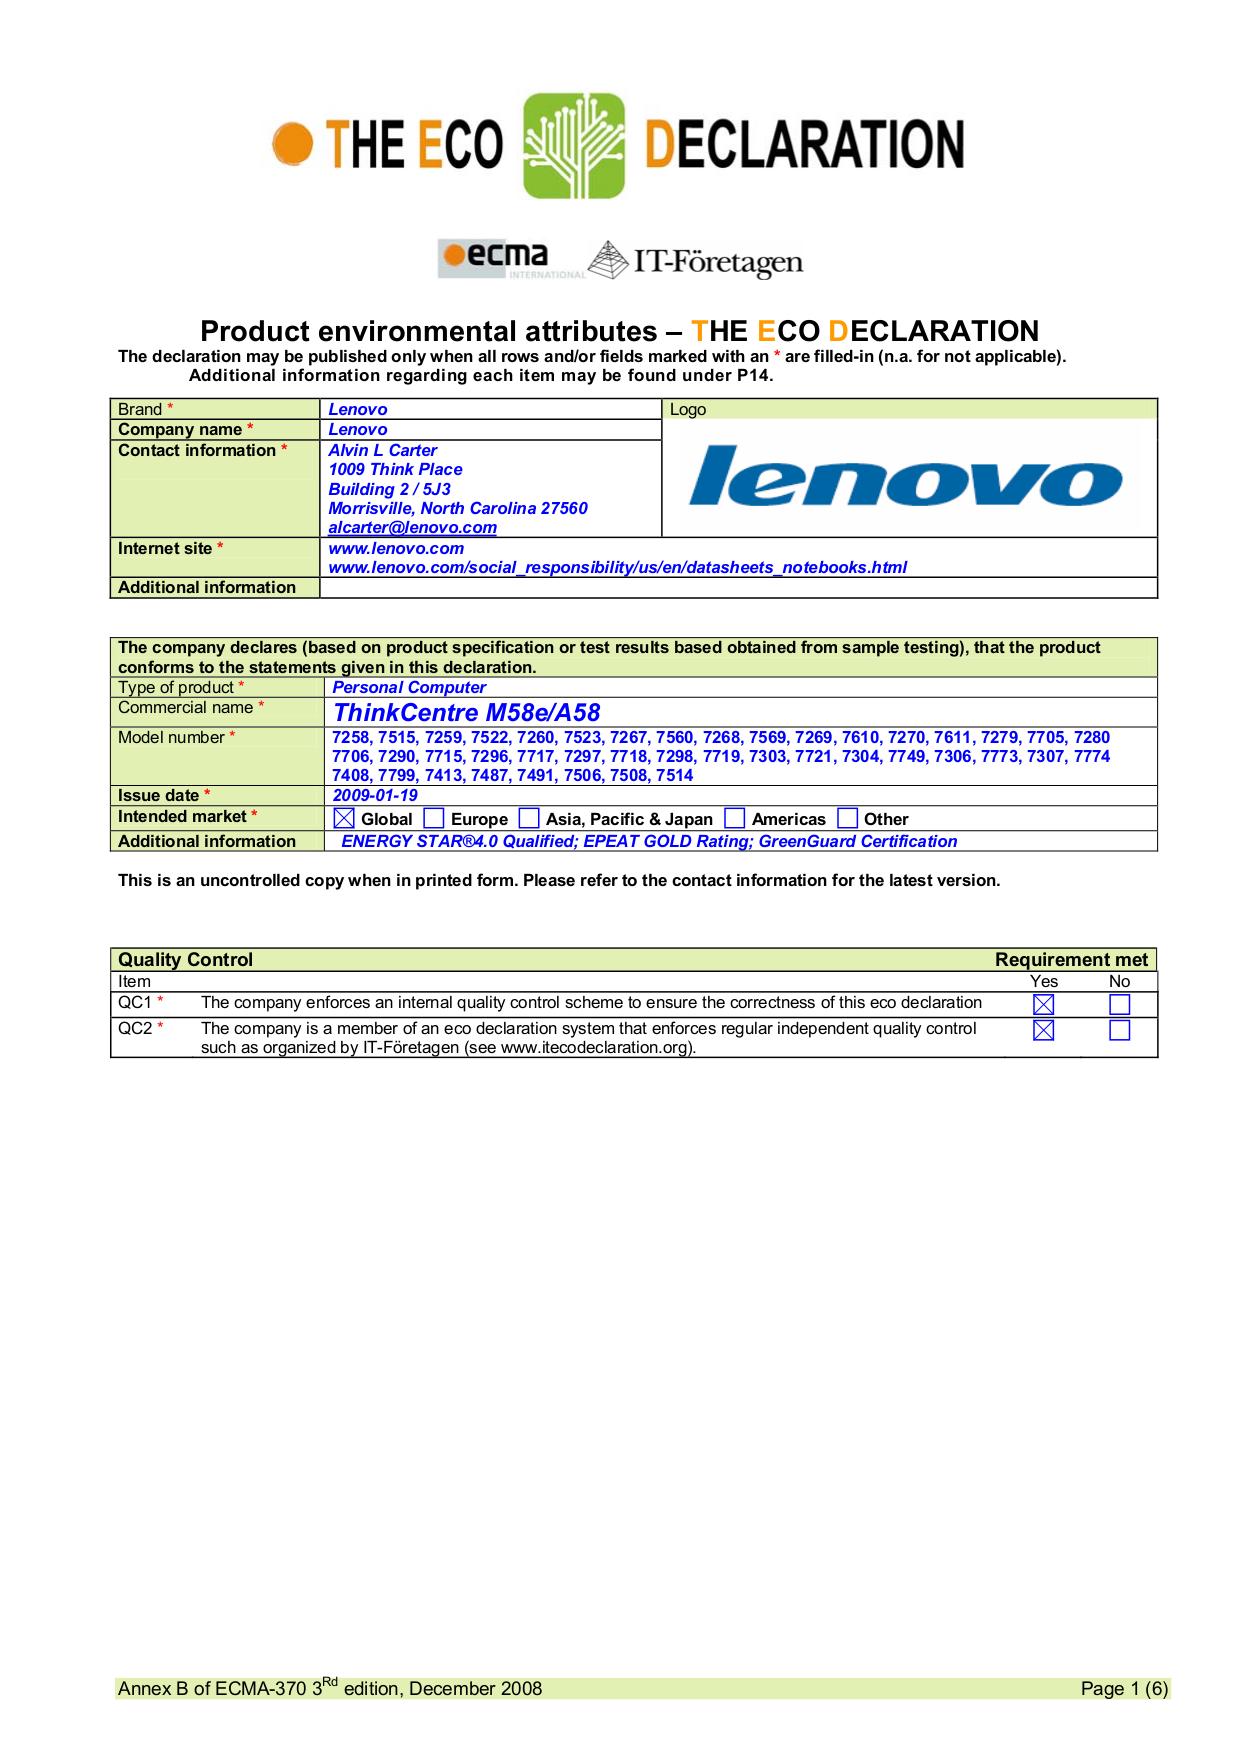 pdf for Lenovo Desktop ThinkCentre A58 7706 manual